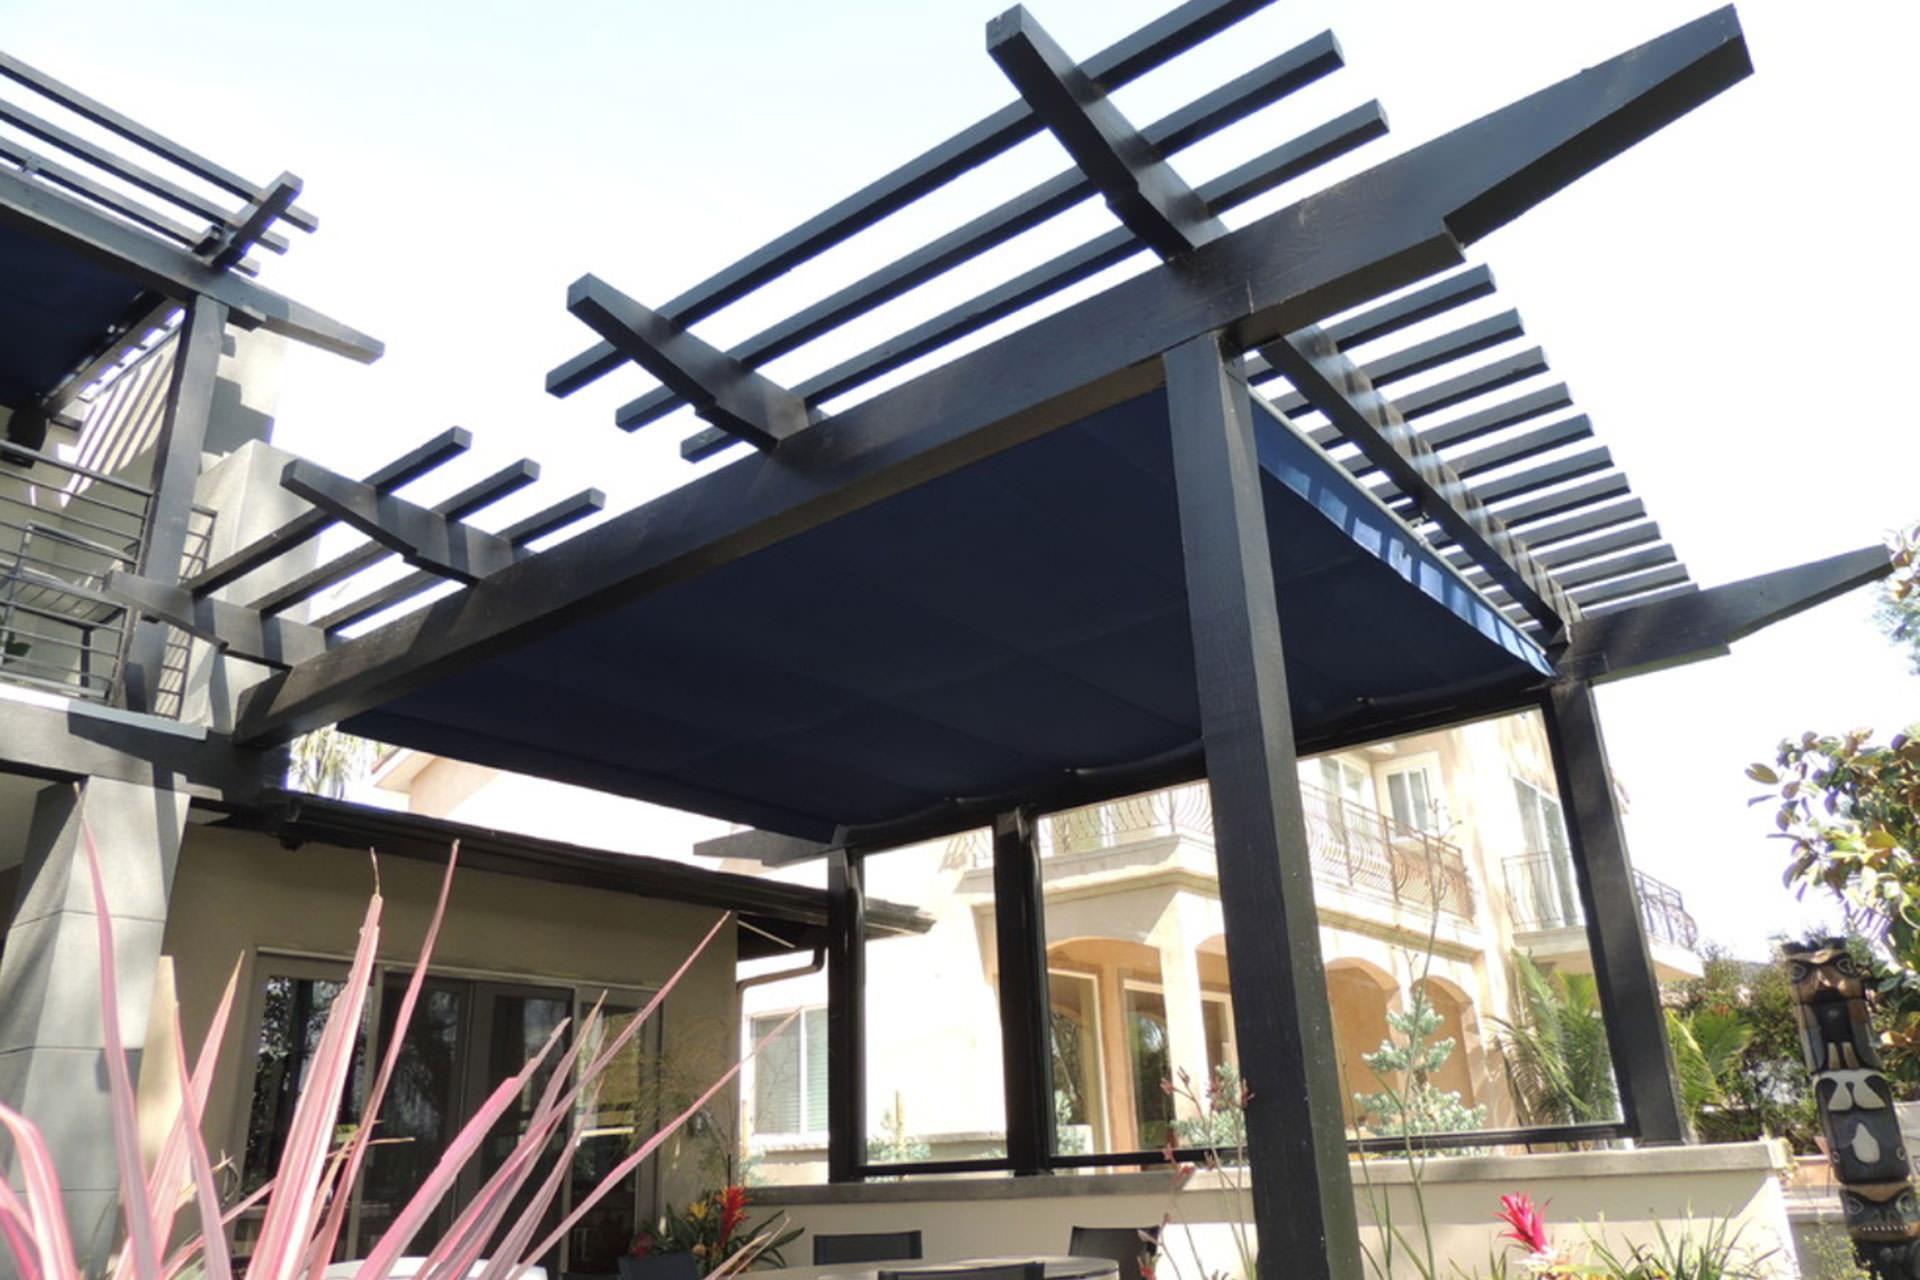 pergolas or patio covers how to choose